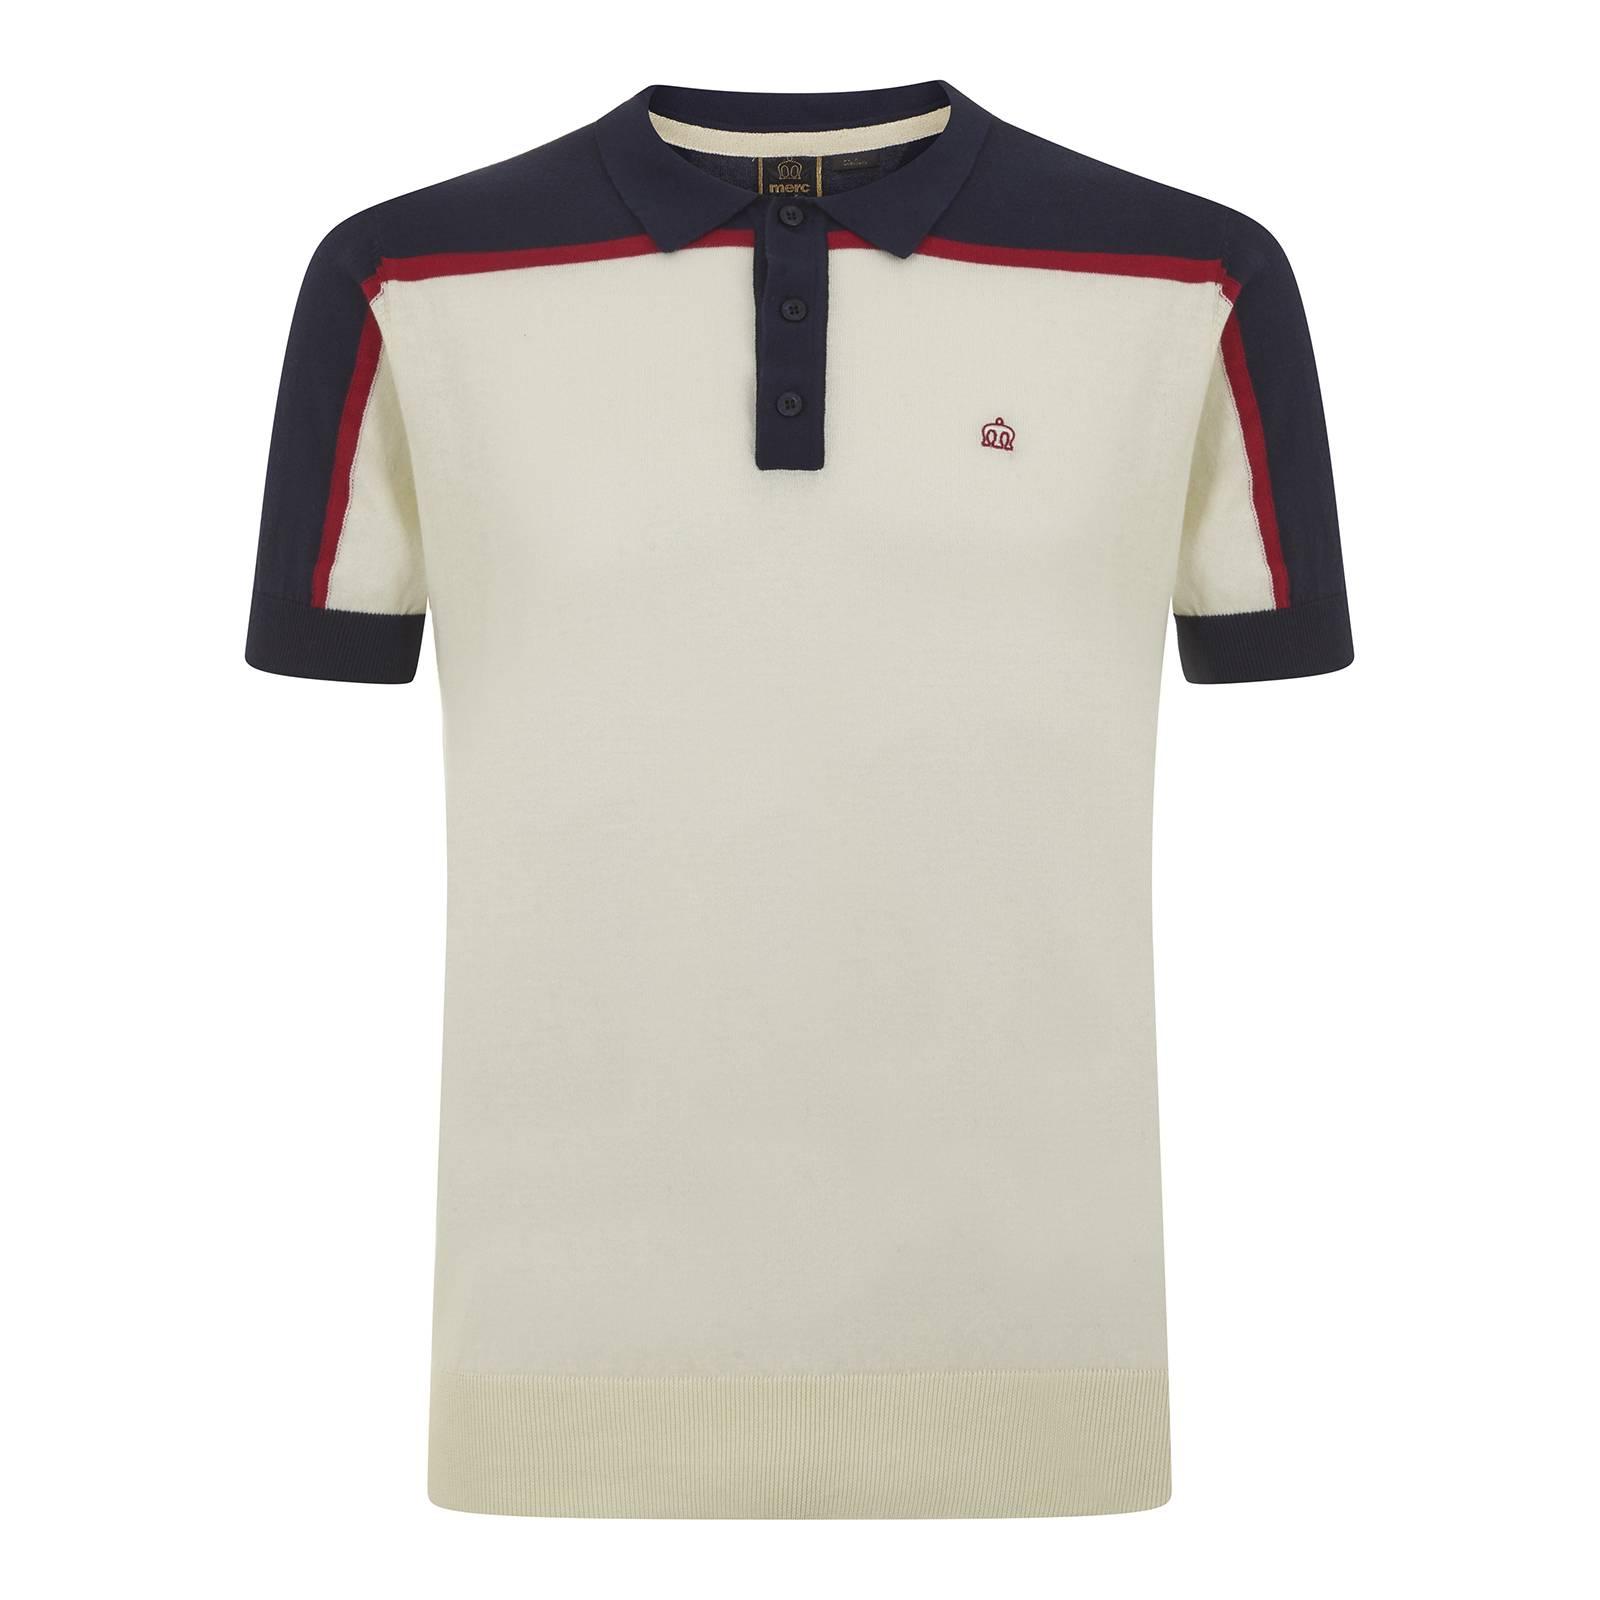 Рубашка Поло HarumПоло<br><br><br>Артикул: 1616102<br>Материал: 100% хлопок<br>Цвет: винтажный белый<br>Пол: Мужской